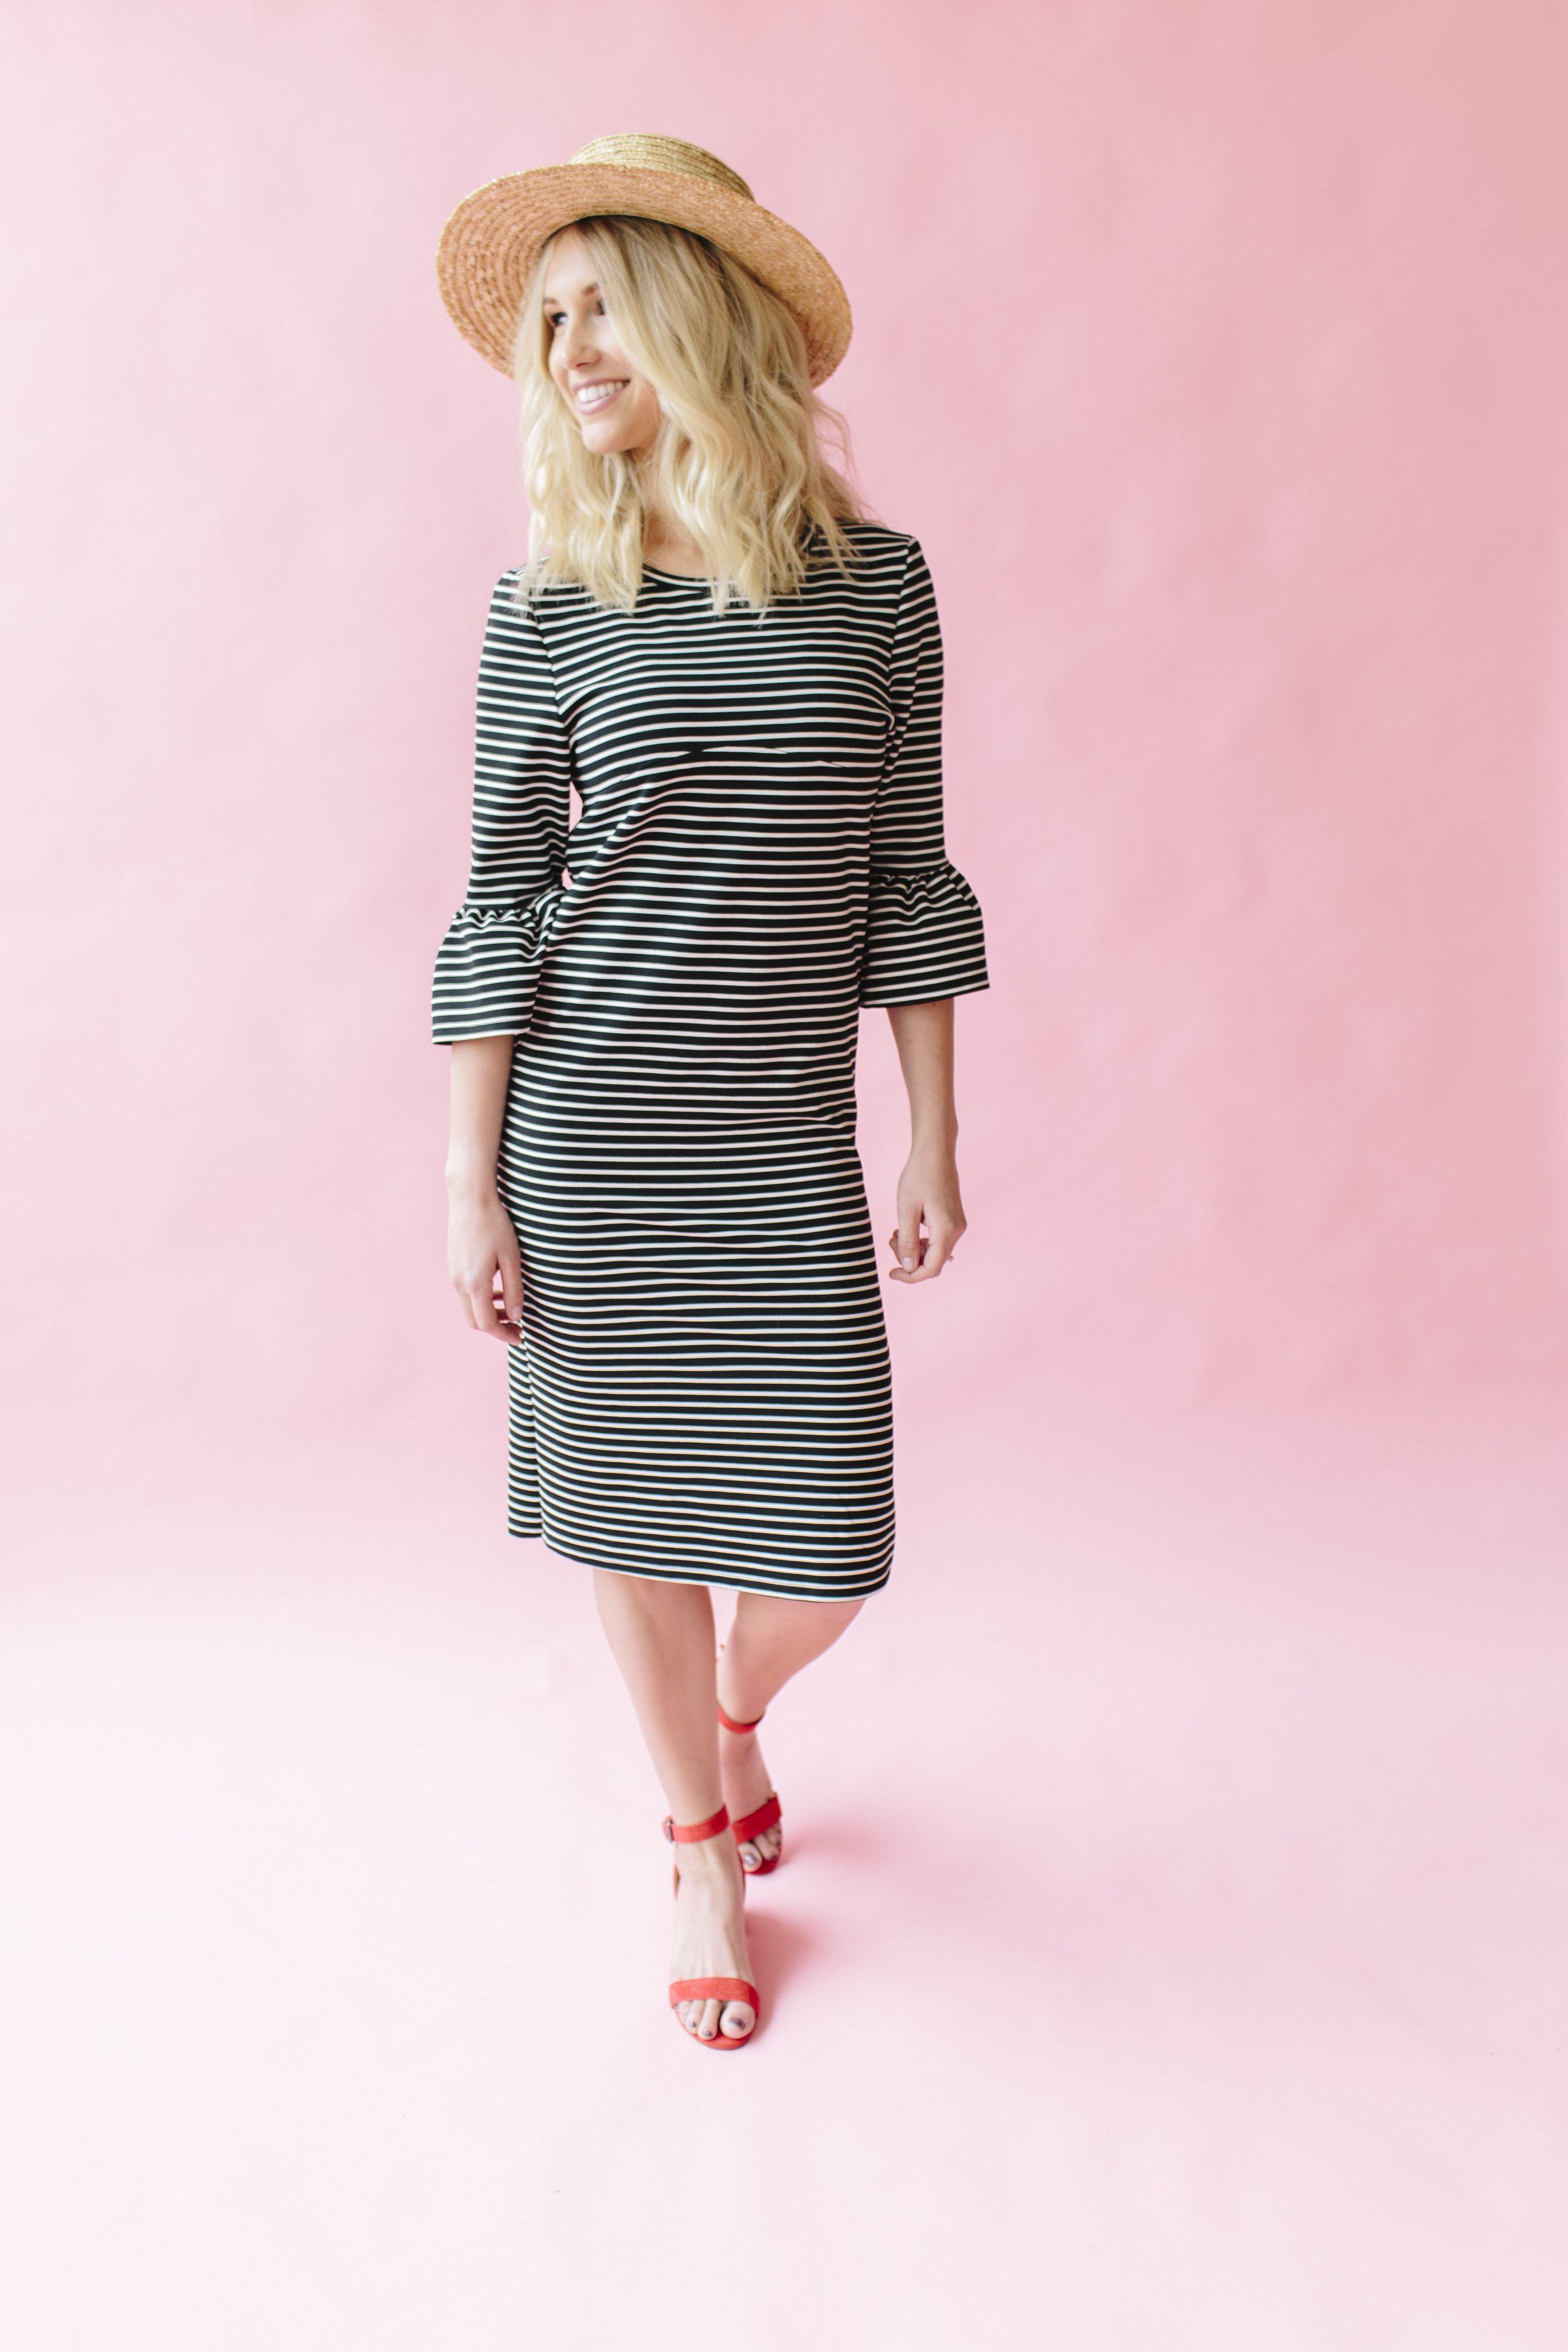 Velvet Wrap Front Dress - Champagne | Traje, Costura y Ropa